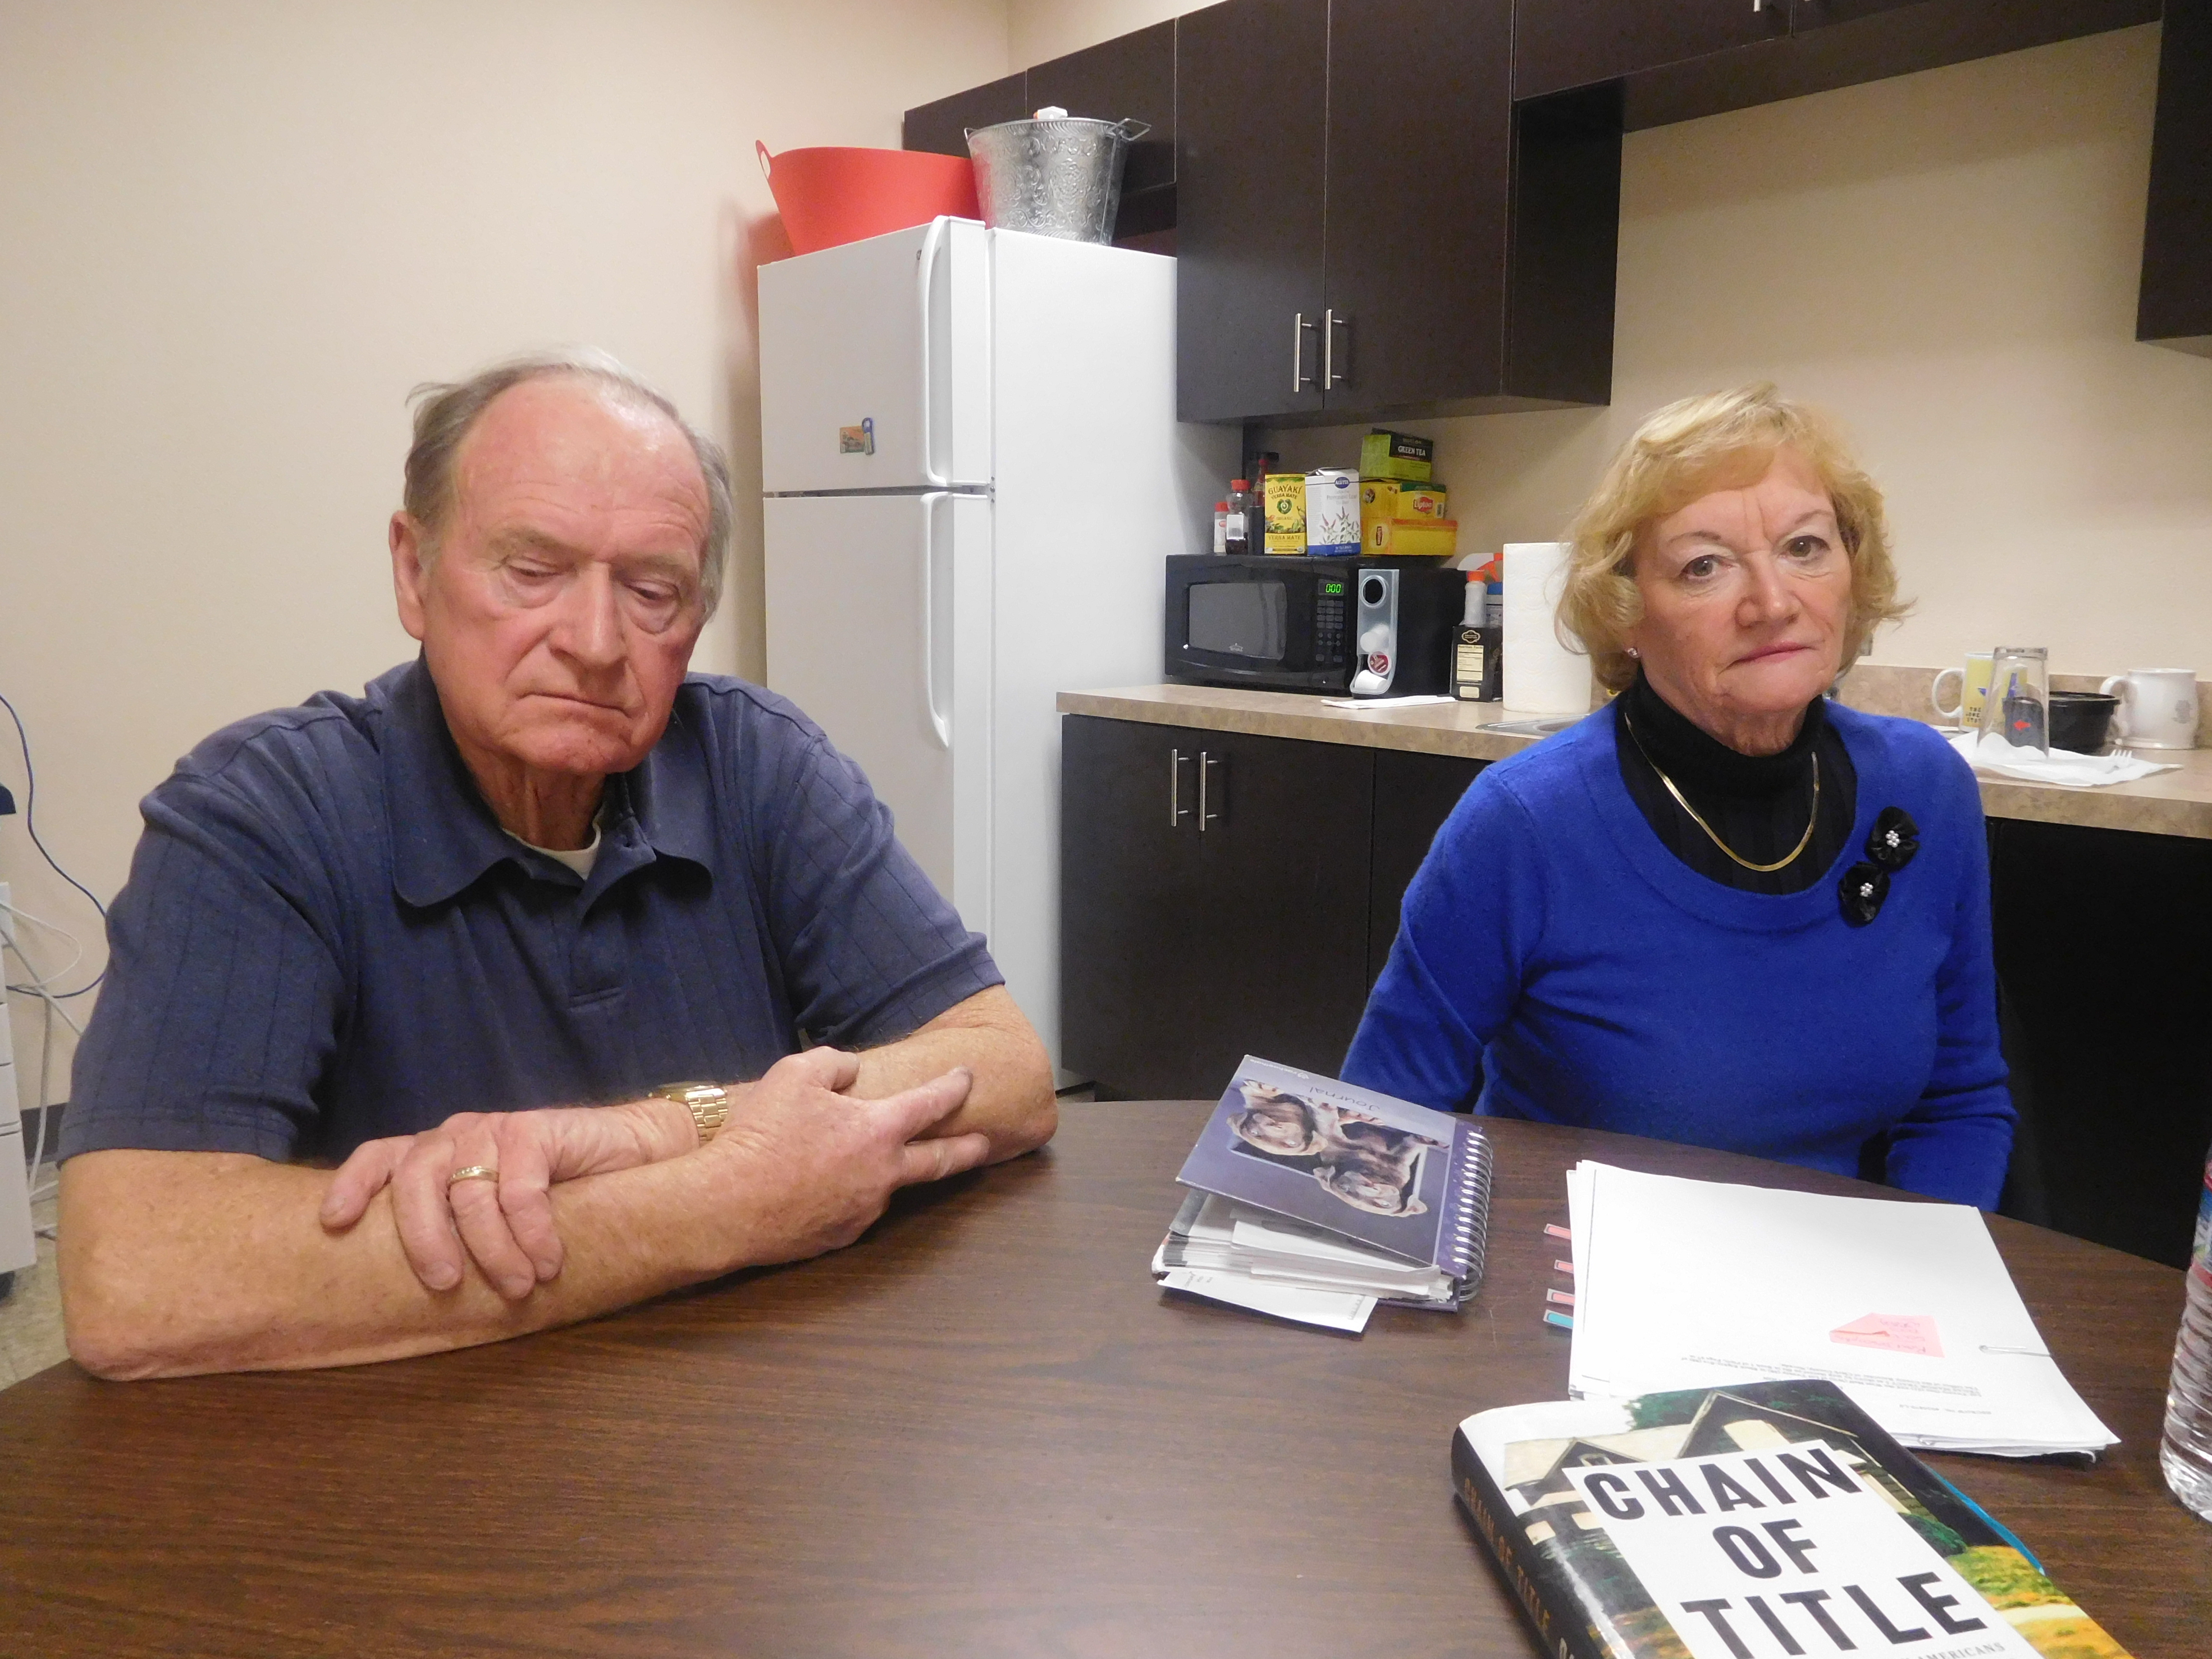 Jon and Diane Hall Discuss Steven Mnuchin